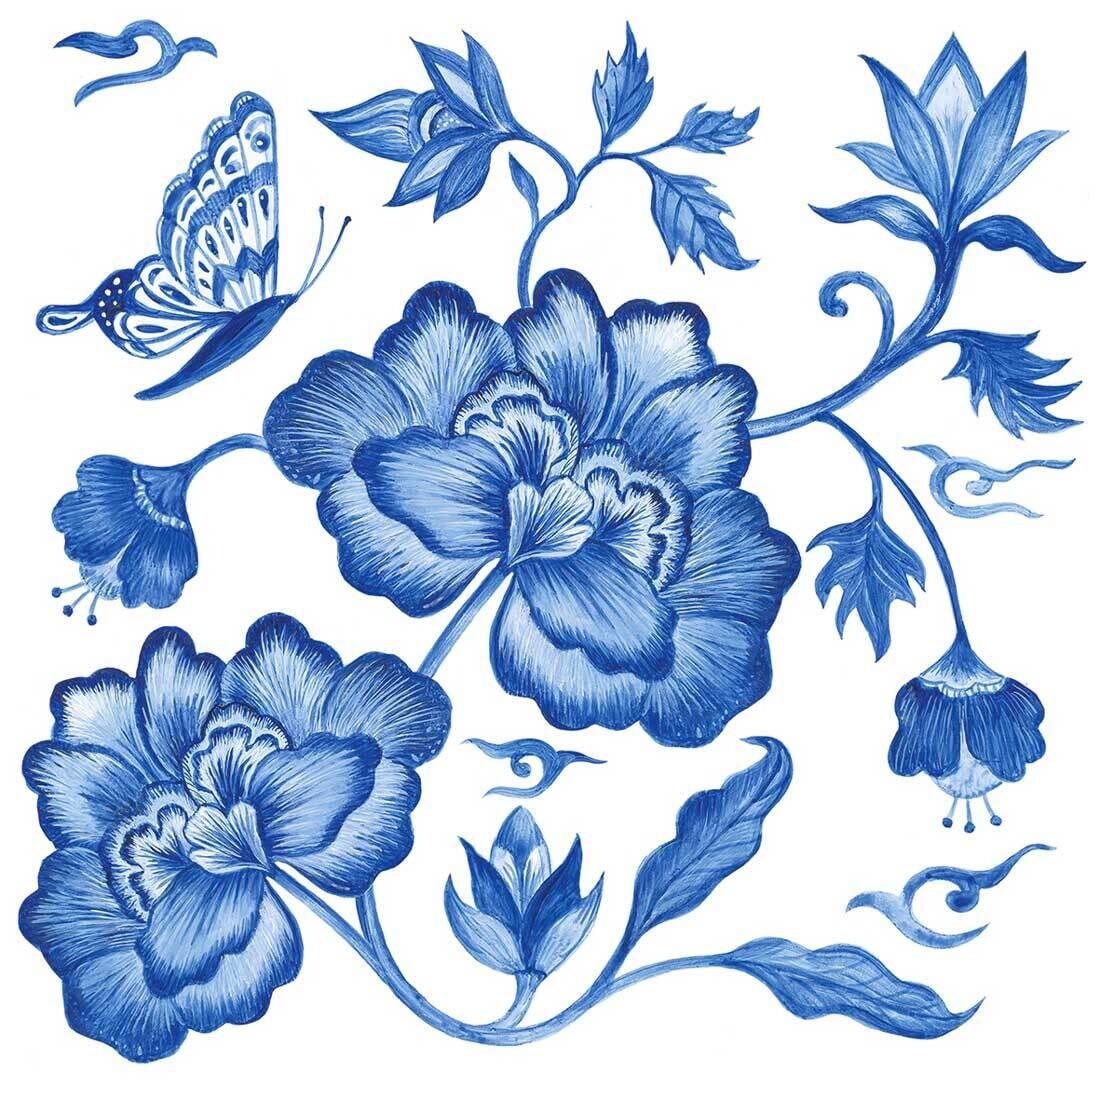 Decoupage Paper Napkins - Floral - Princess Peony (1 Sheet)